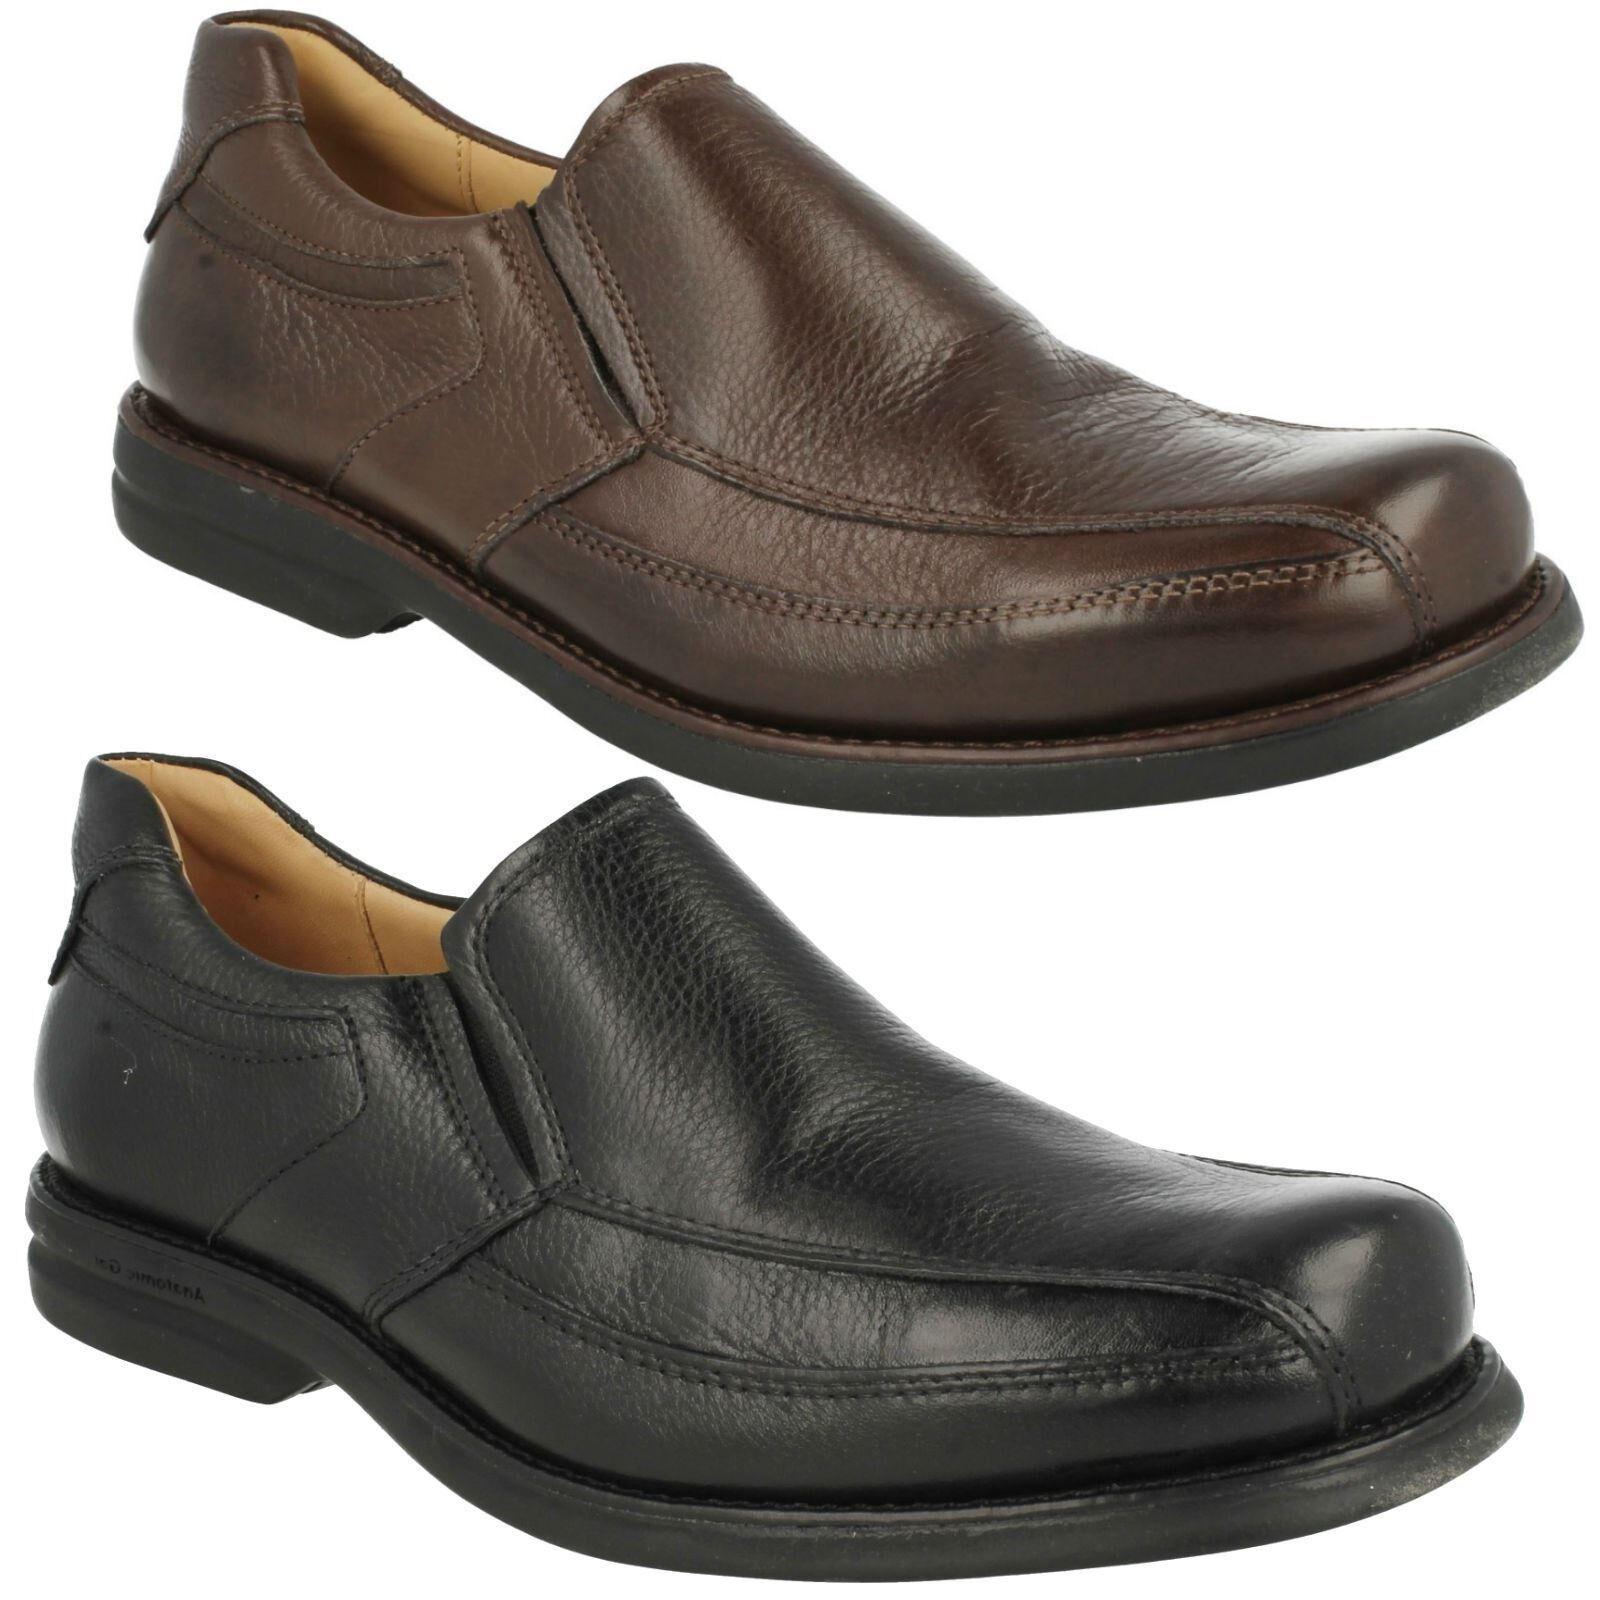 URUPA Herren ANATOMIC & CO URUPA  LEATHER BLACK BROWN SLIP ON COMFORT SMART LOAFERS Schuhe a90fcf